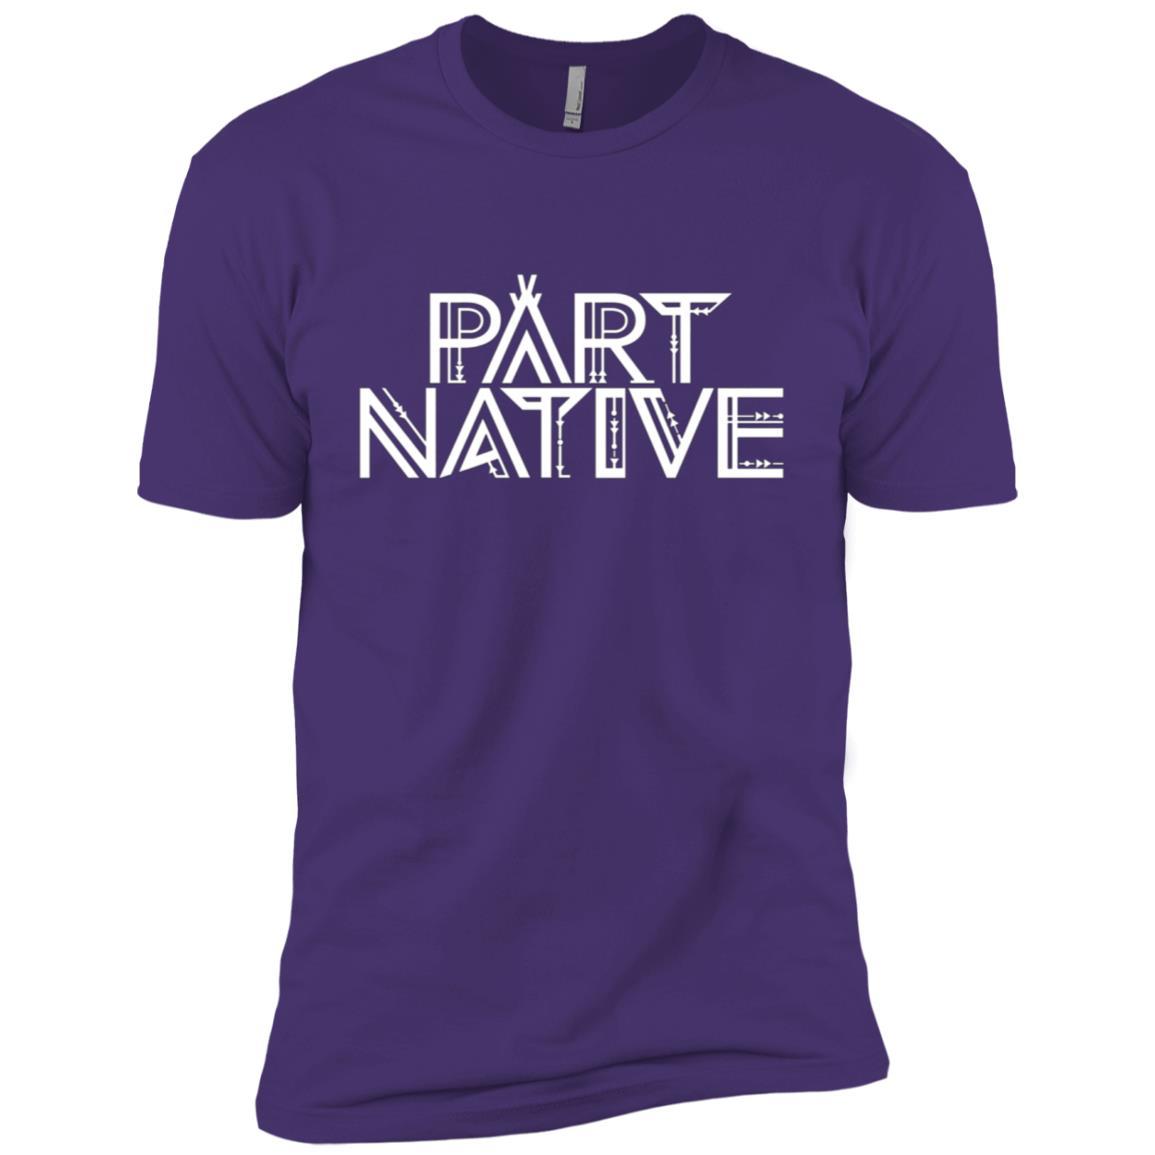 Part Native – Indigenous Peoples Day Men Short Sleeve T-Shirt